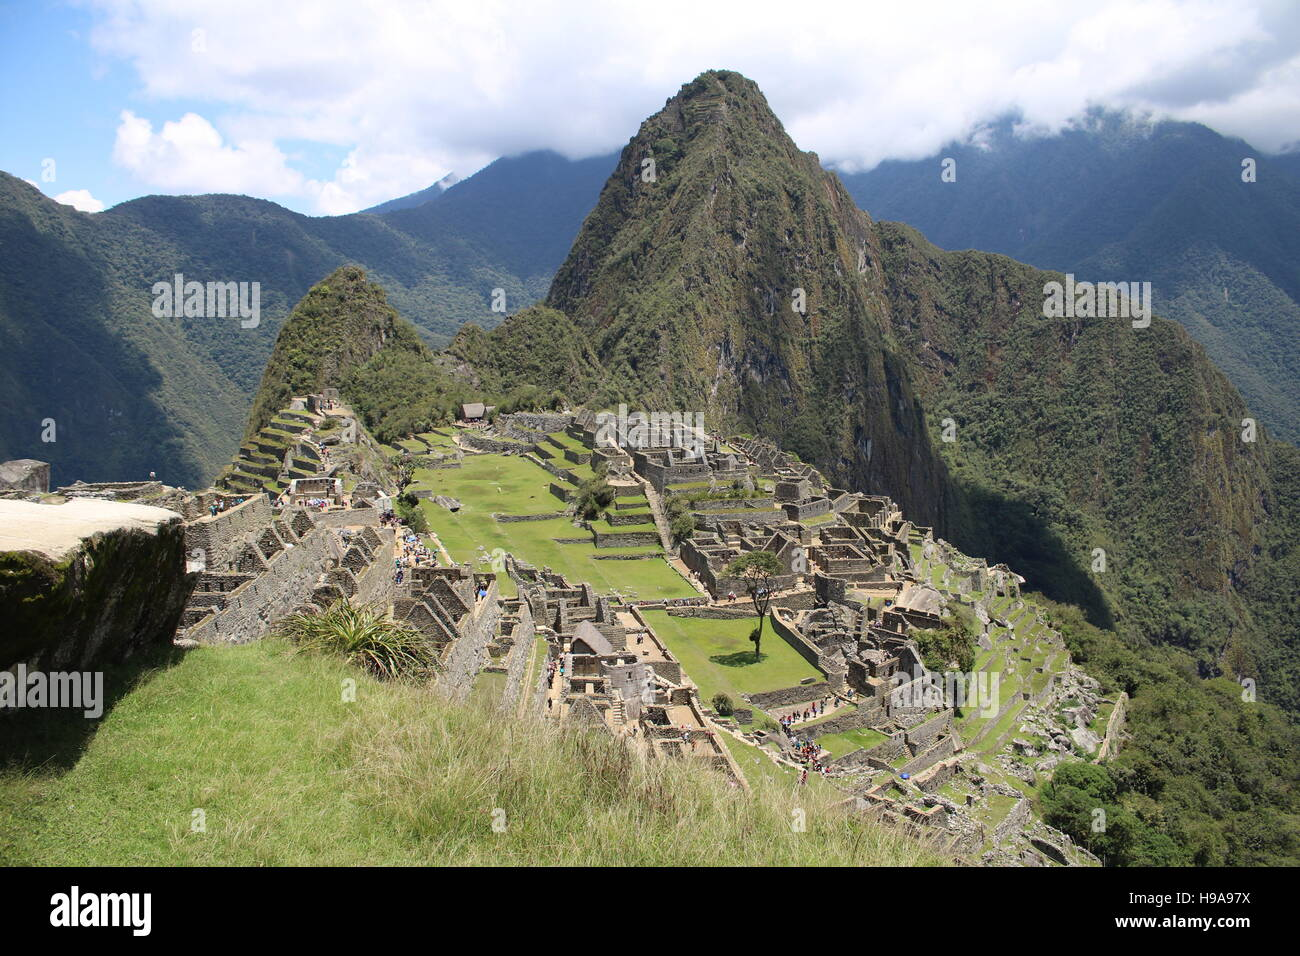 Machu Picchu - Aguas Calientes - Cusco Photo Stock